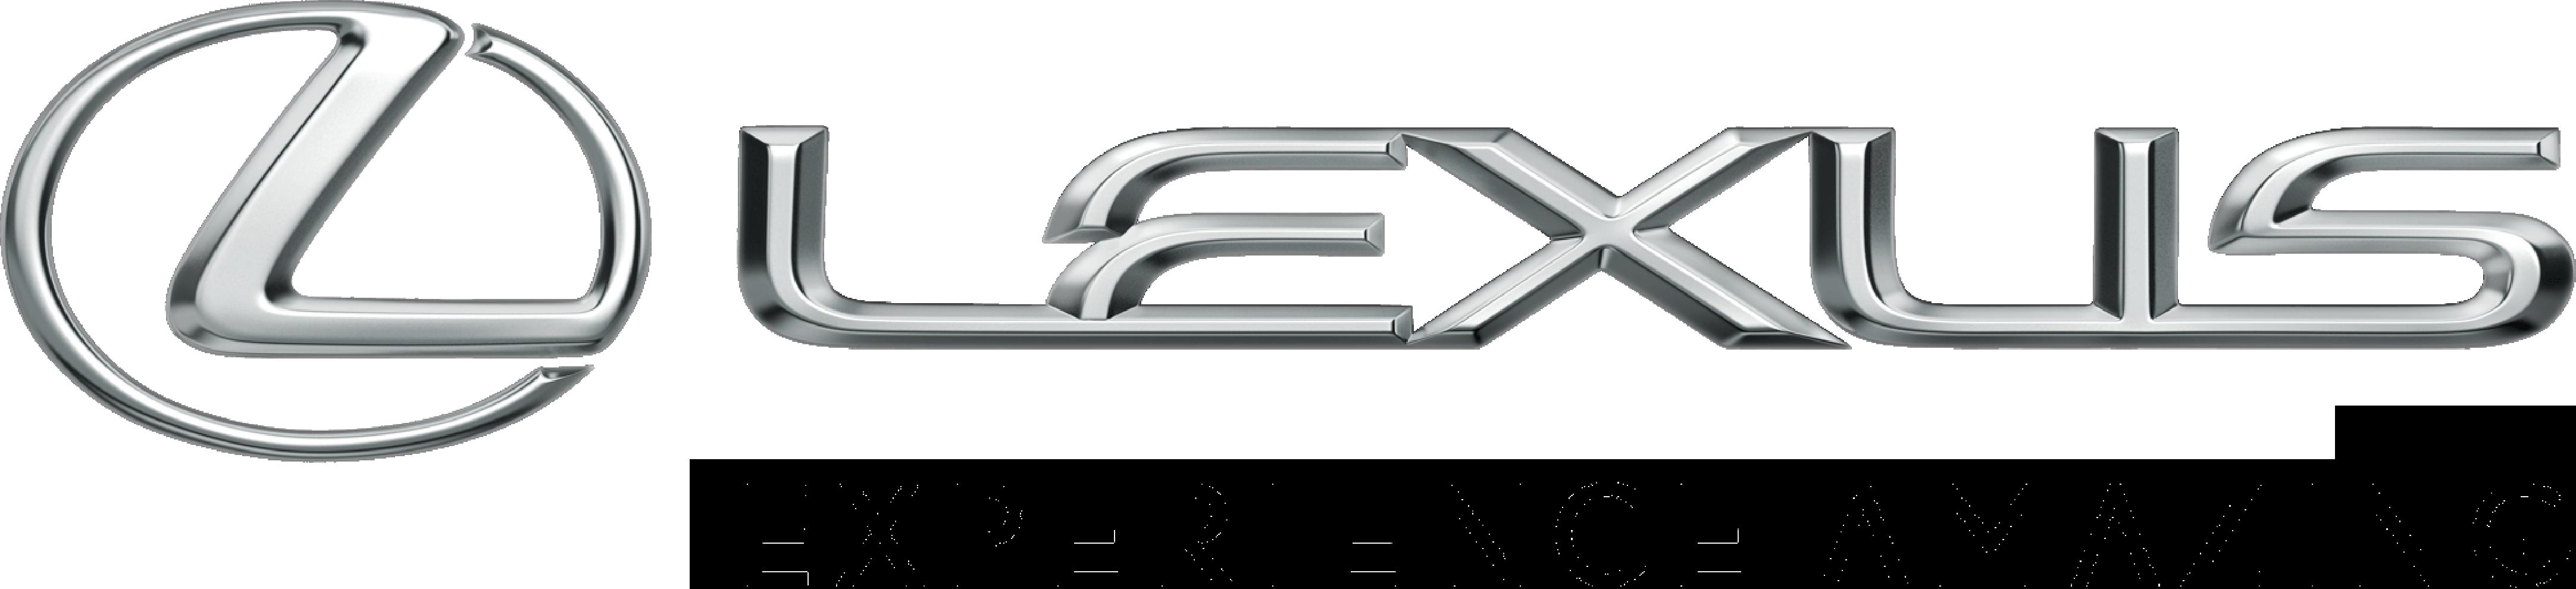 4329x989 Lexus Logo Pngampsvg Download